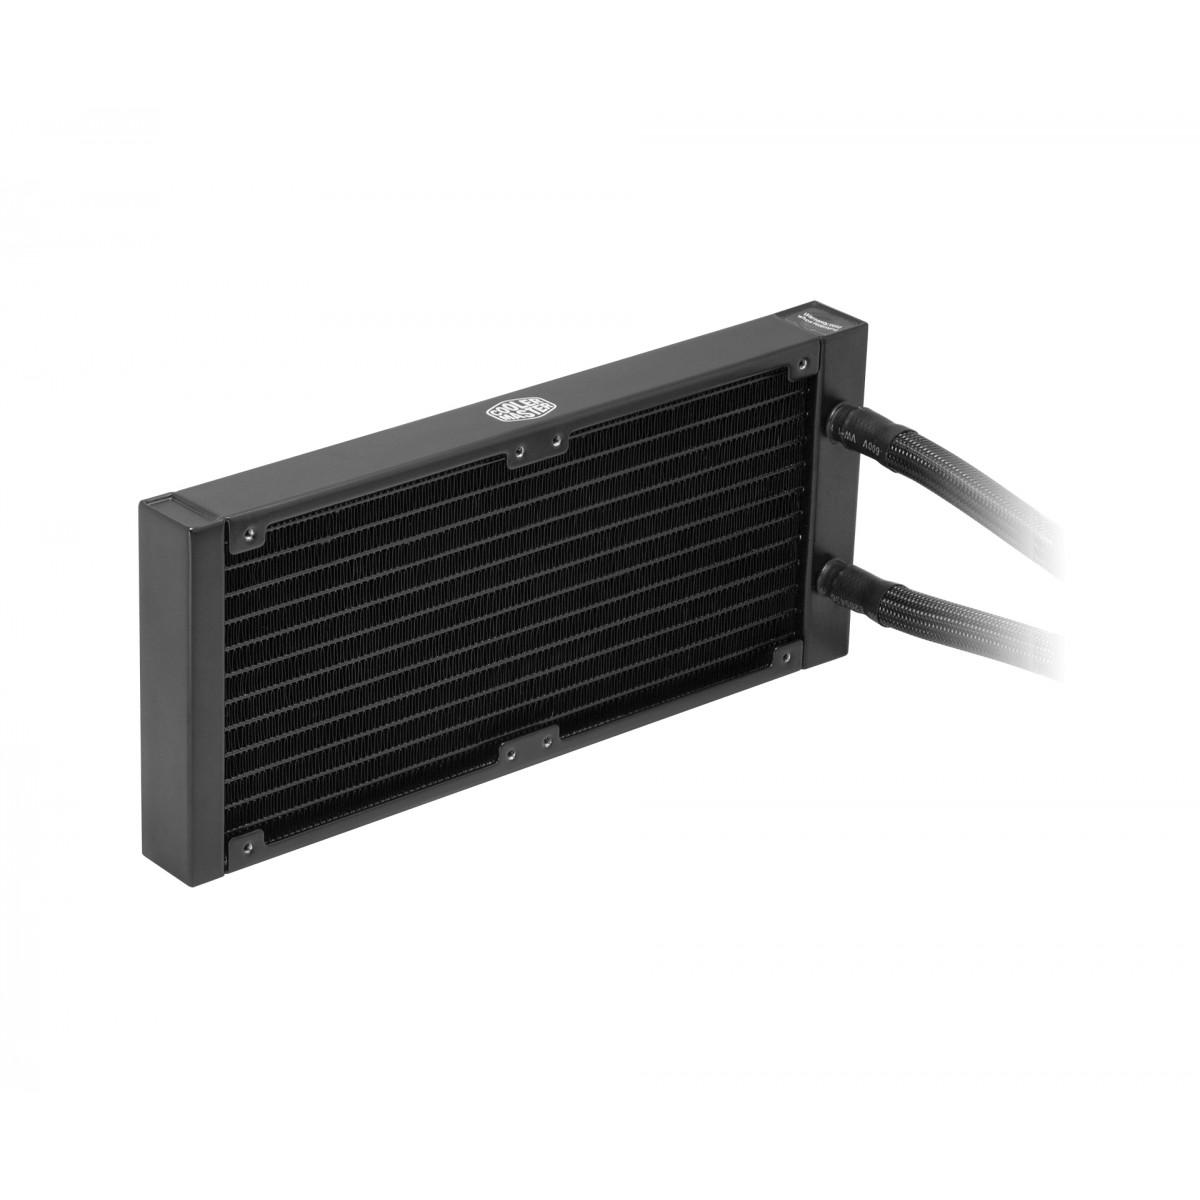 Water Cooler Cooler Master Masterliquid ML280 TR4 EDITION, 280mm, RGB, Intel-AMD, MLX-D28M-A13PC-T1